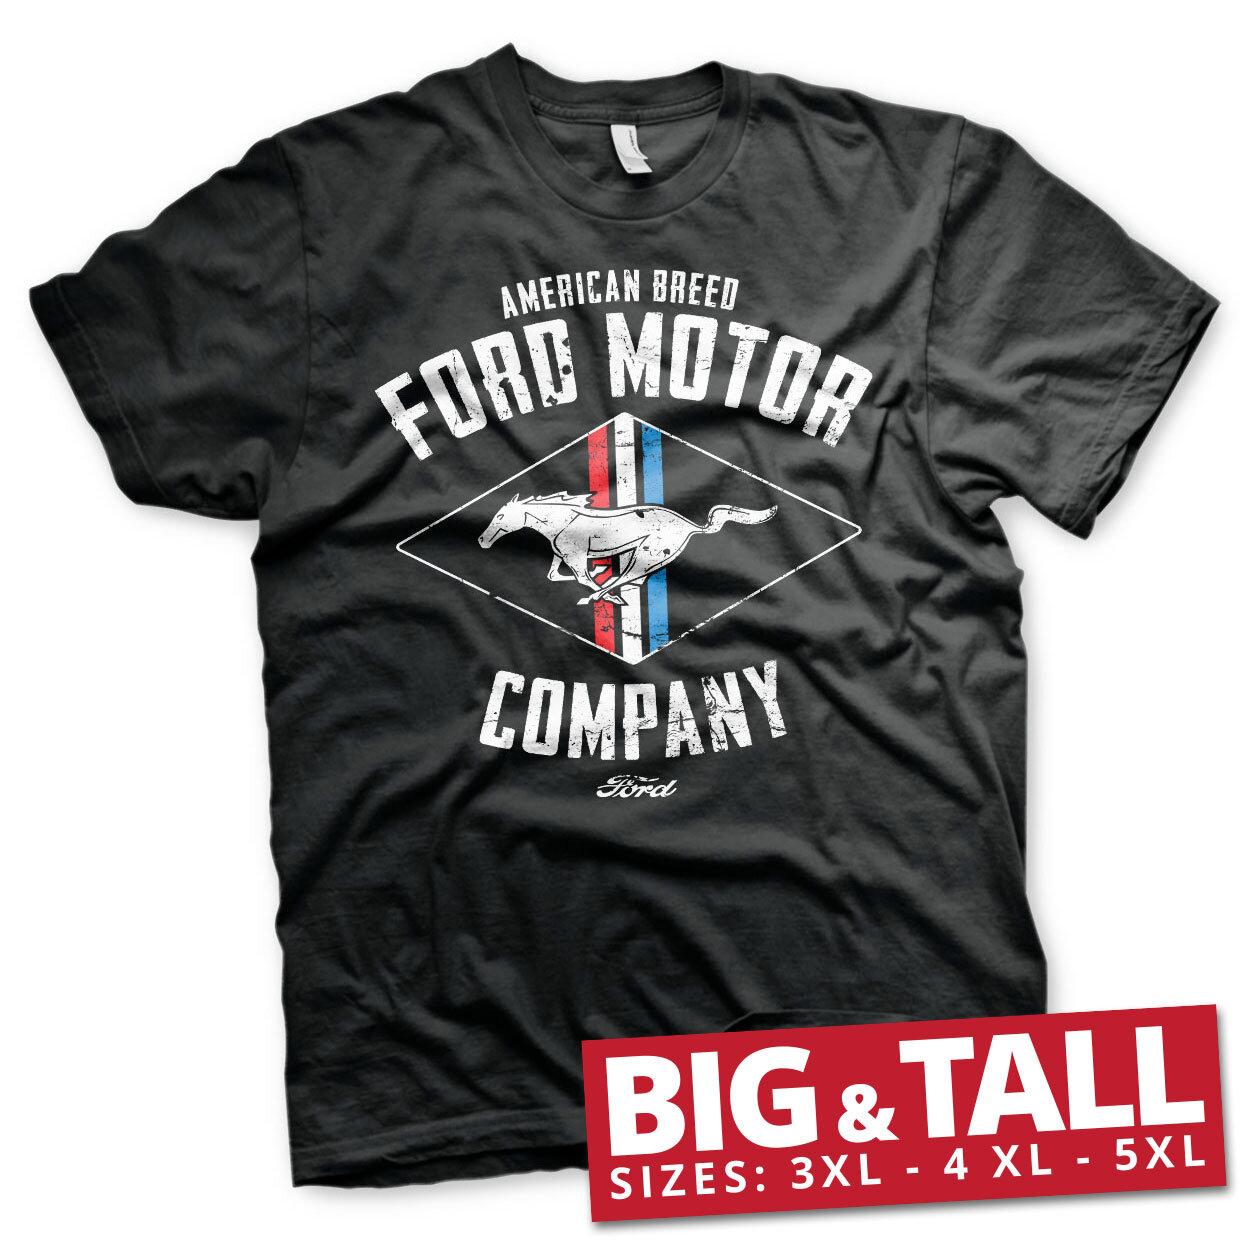 Ford Motor - American Breed Big & Tall T-Shirt